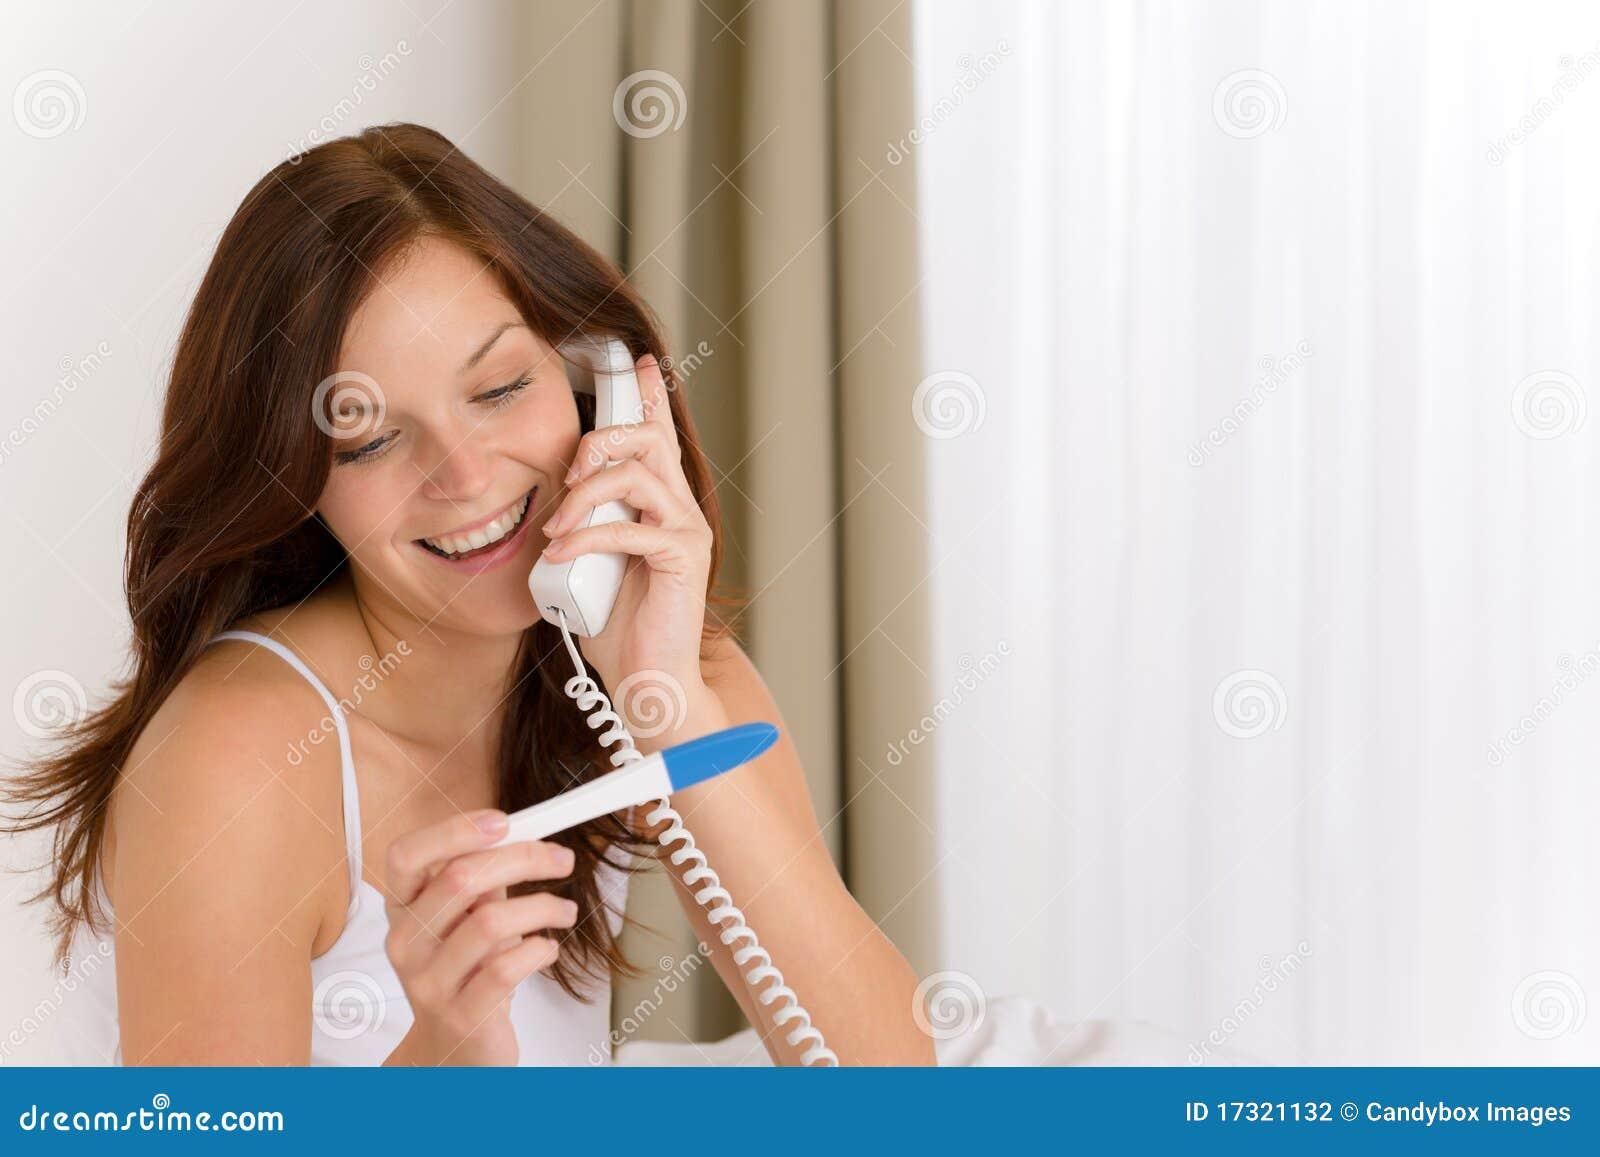 Schwangerschaftprüfung - glückliche Frau am Telefon